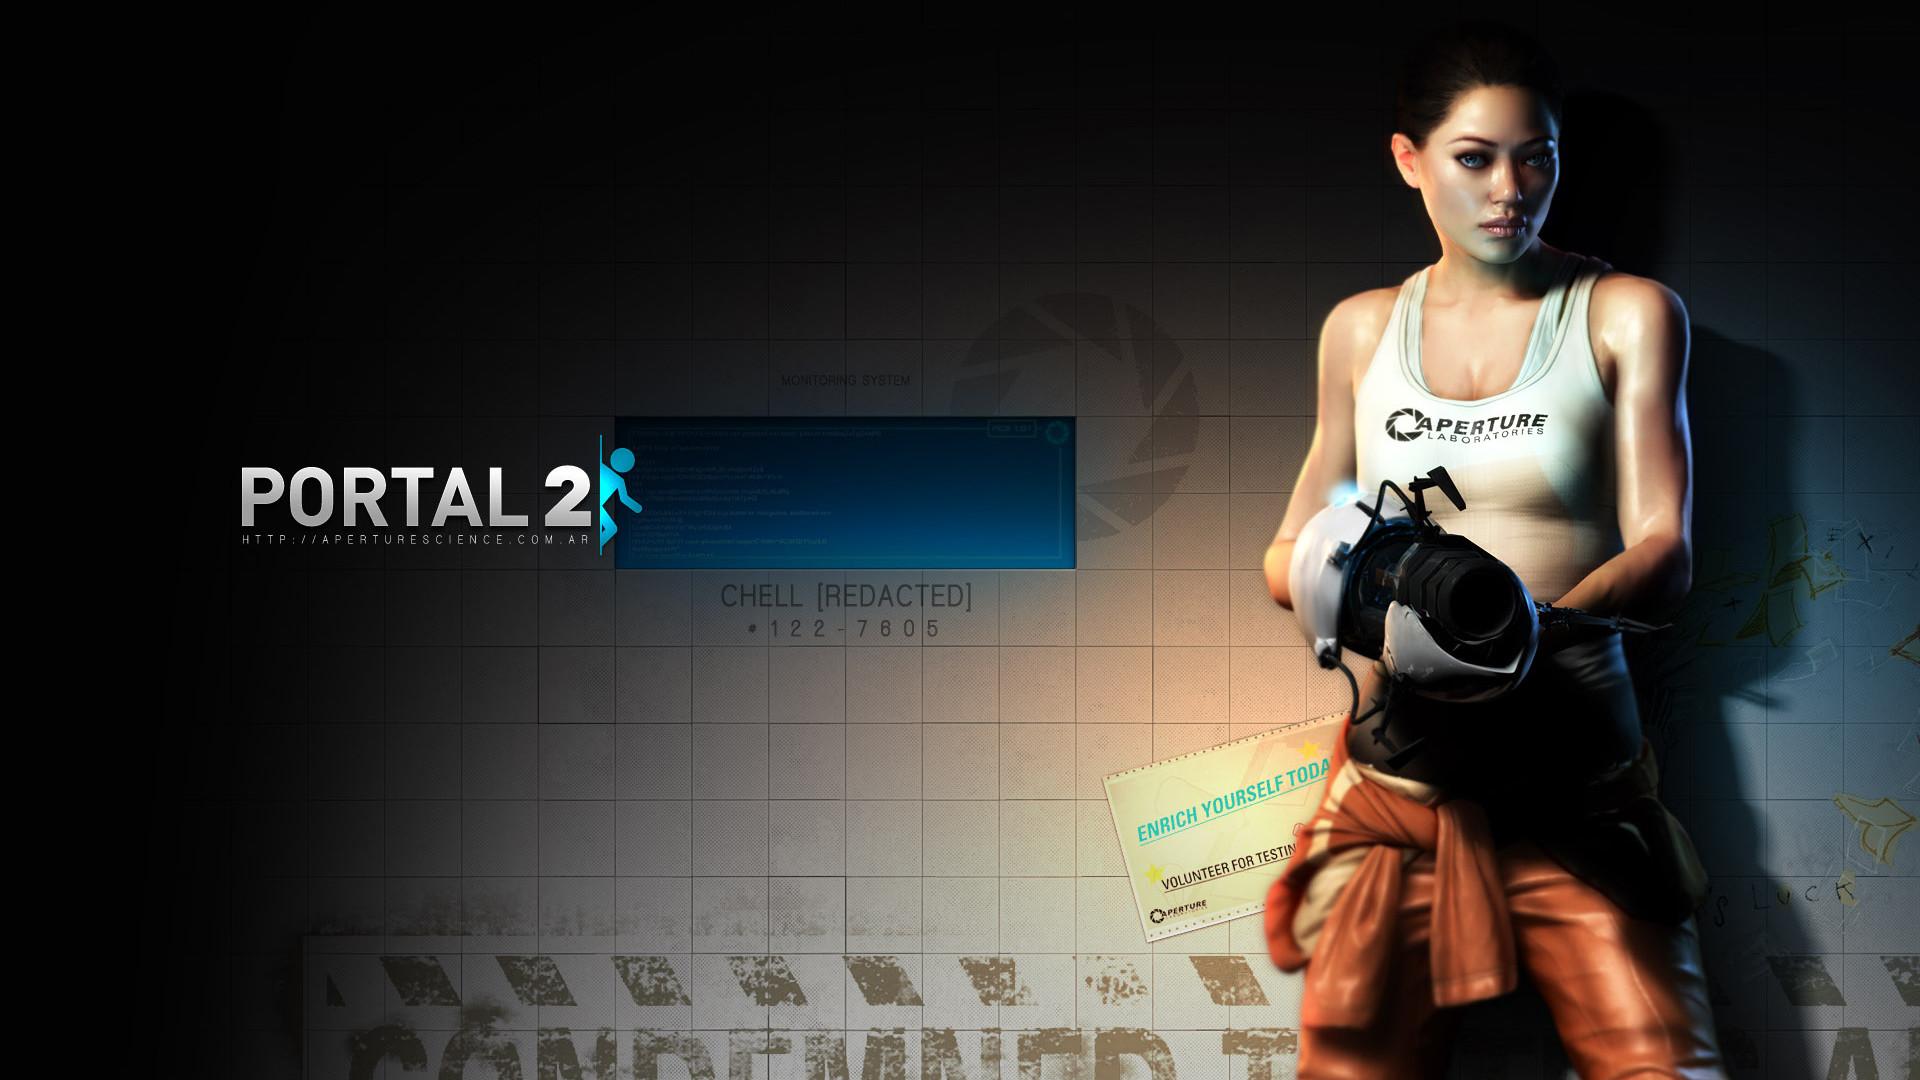 Portal 2 Aperture Laboratories